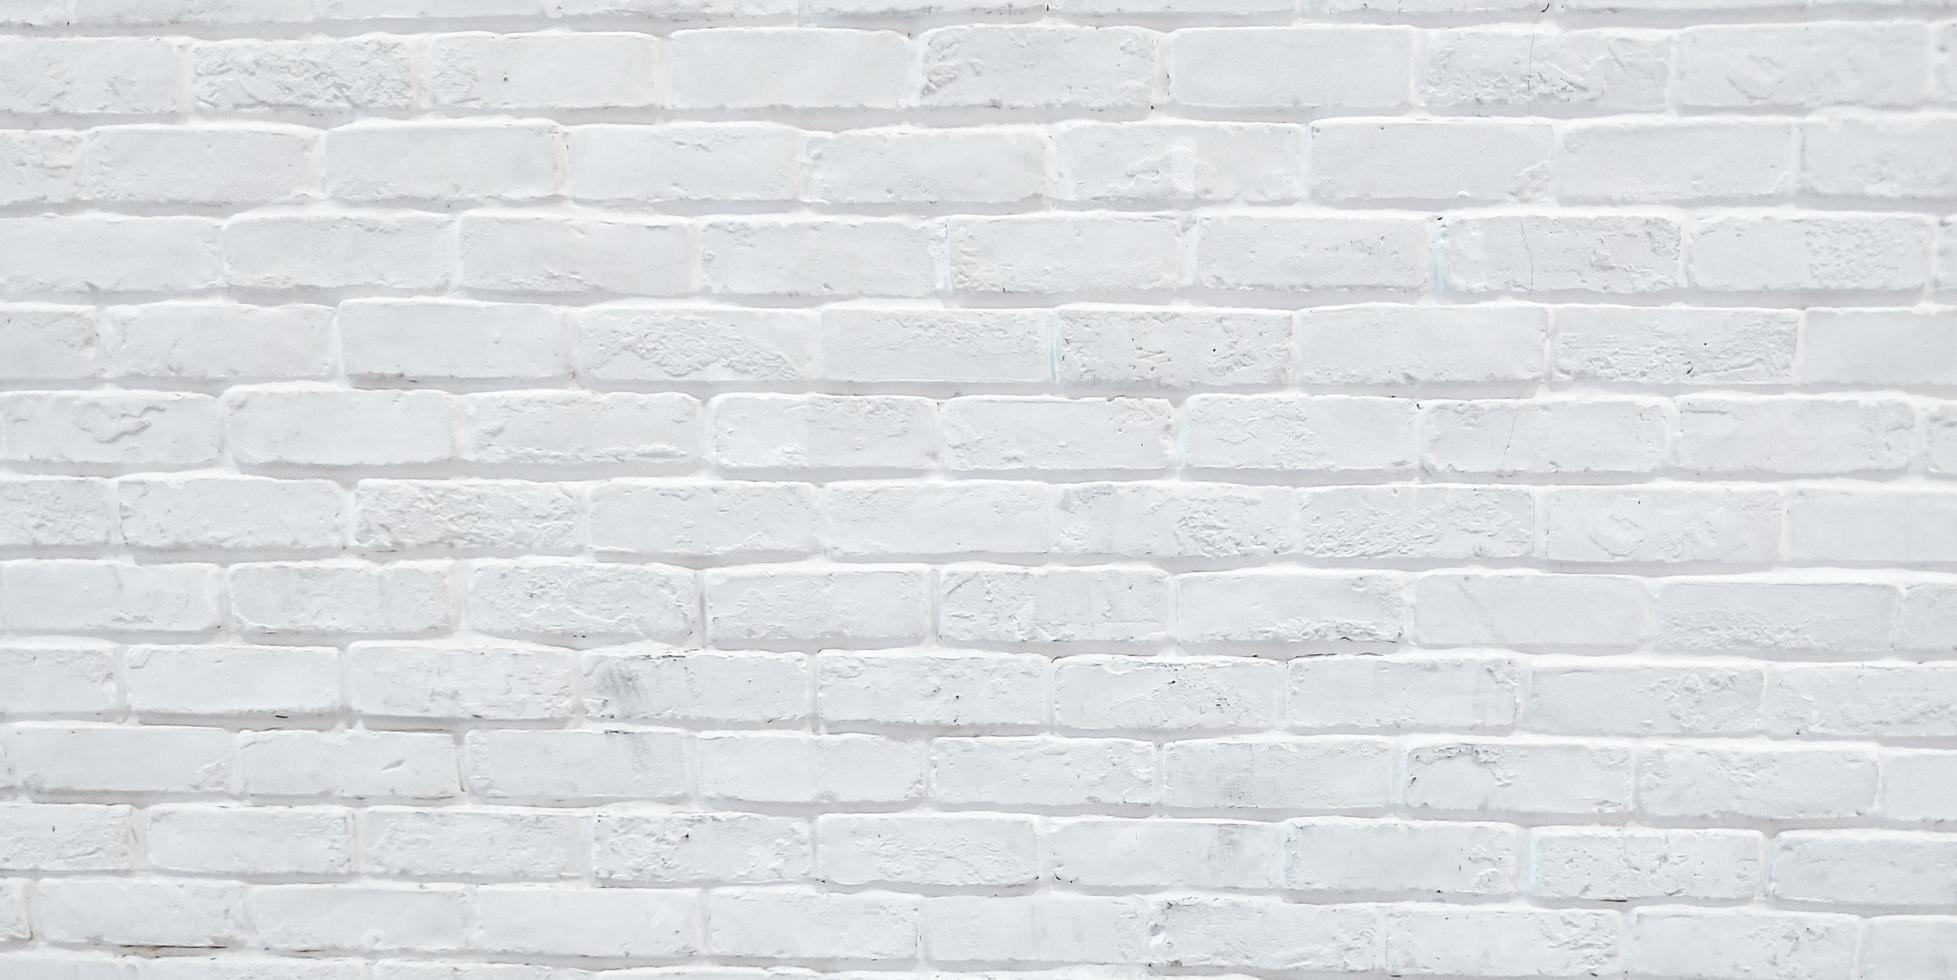 moderno muro di mattoni bianchi foto